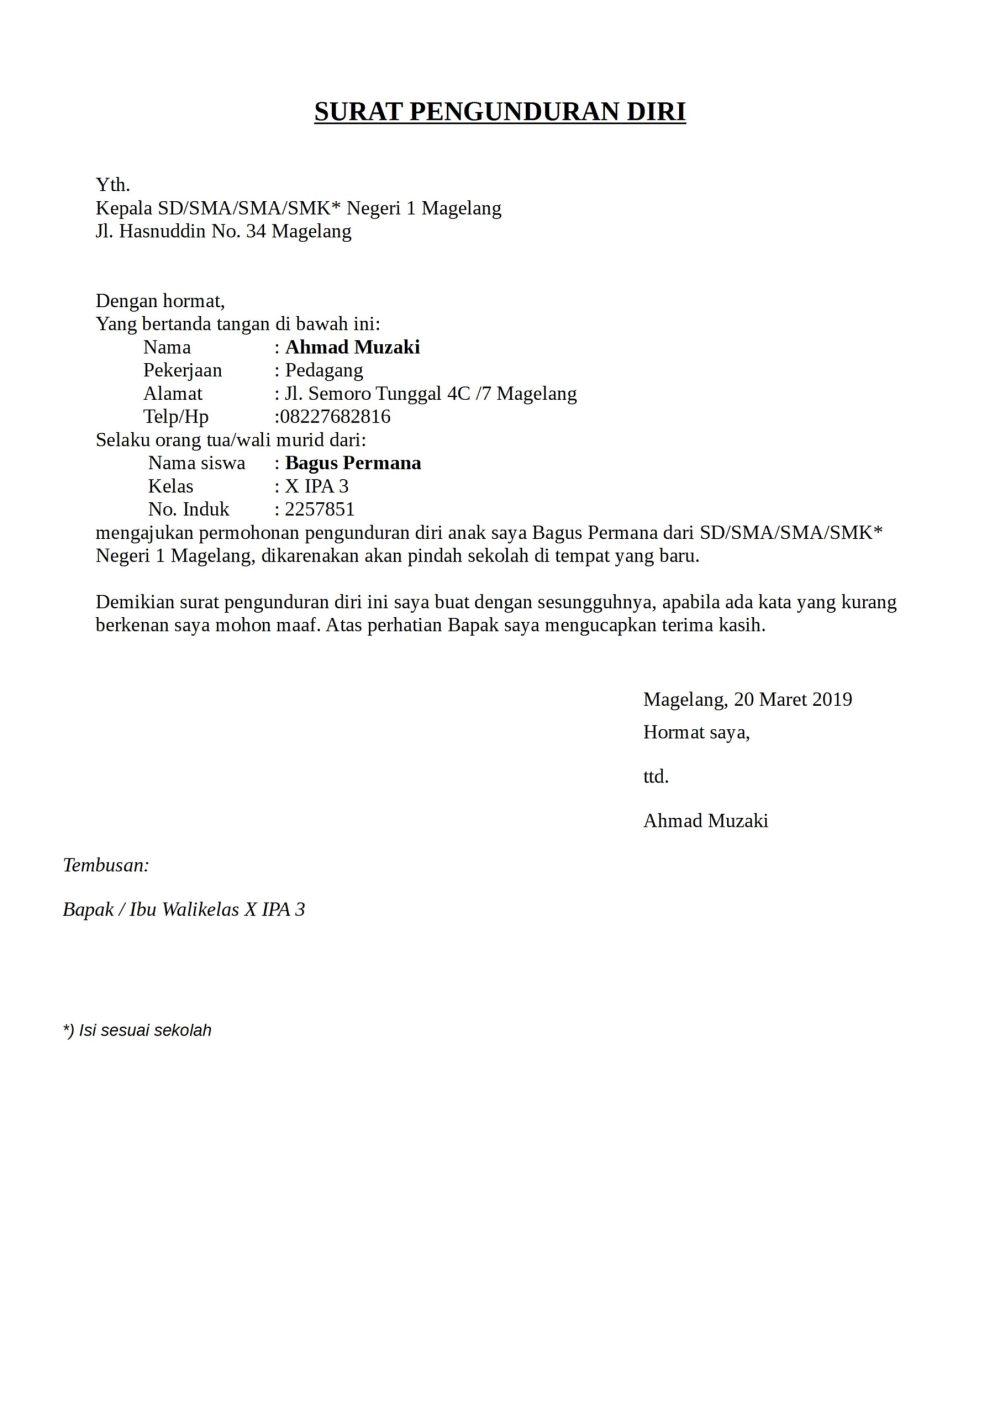 4. Contoh Surat Pengunduran Diri Dari Sekolah Sebagai Tata Usaha Pegawai